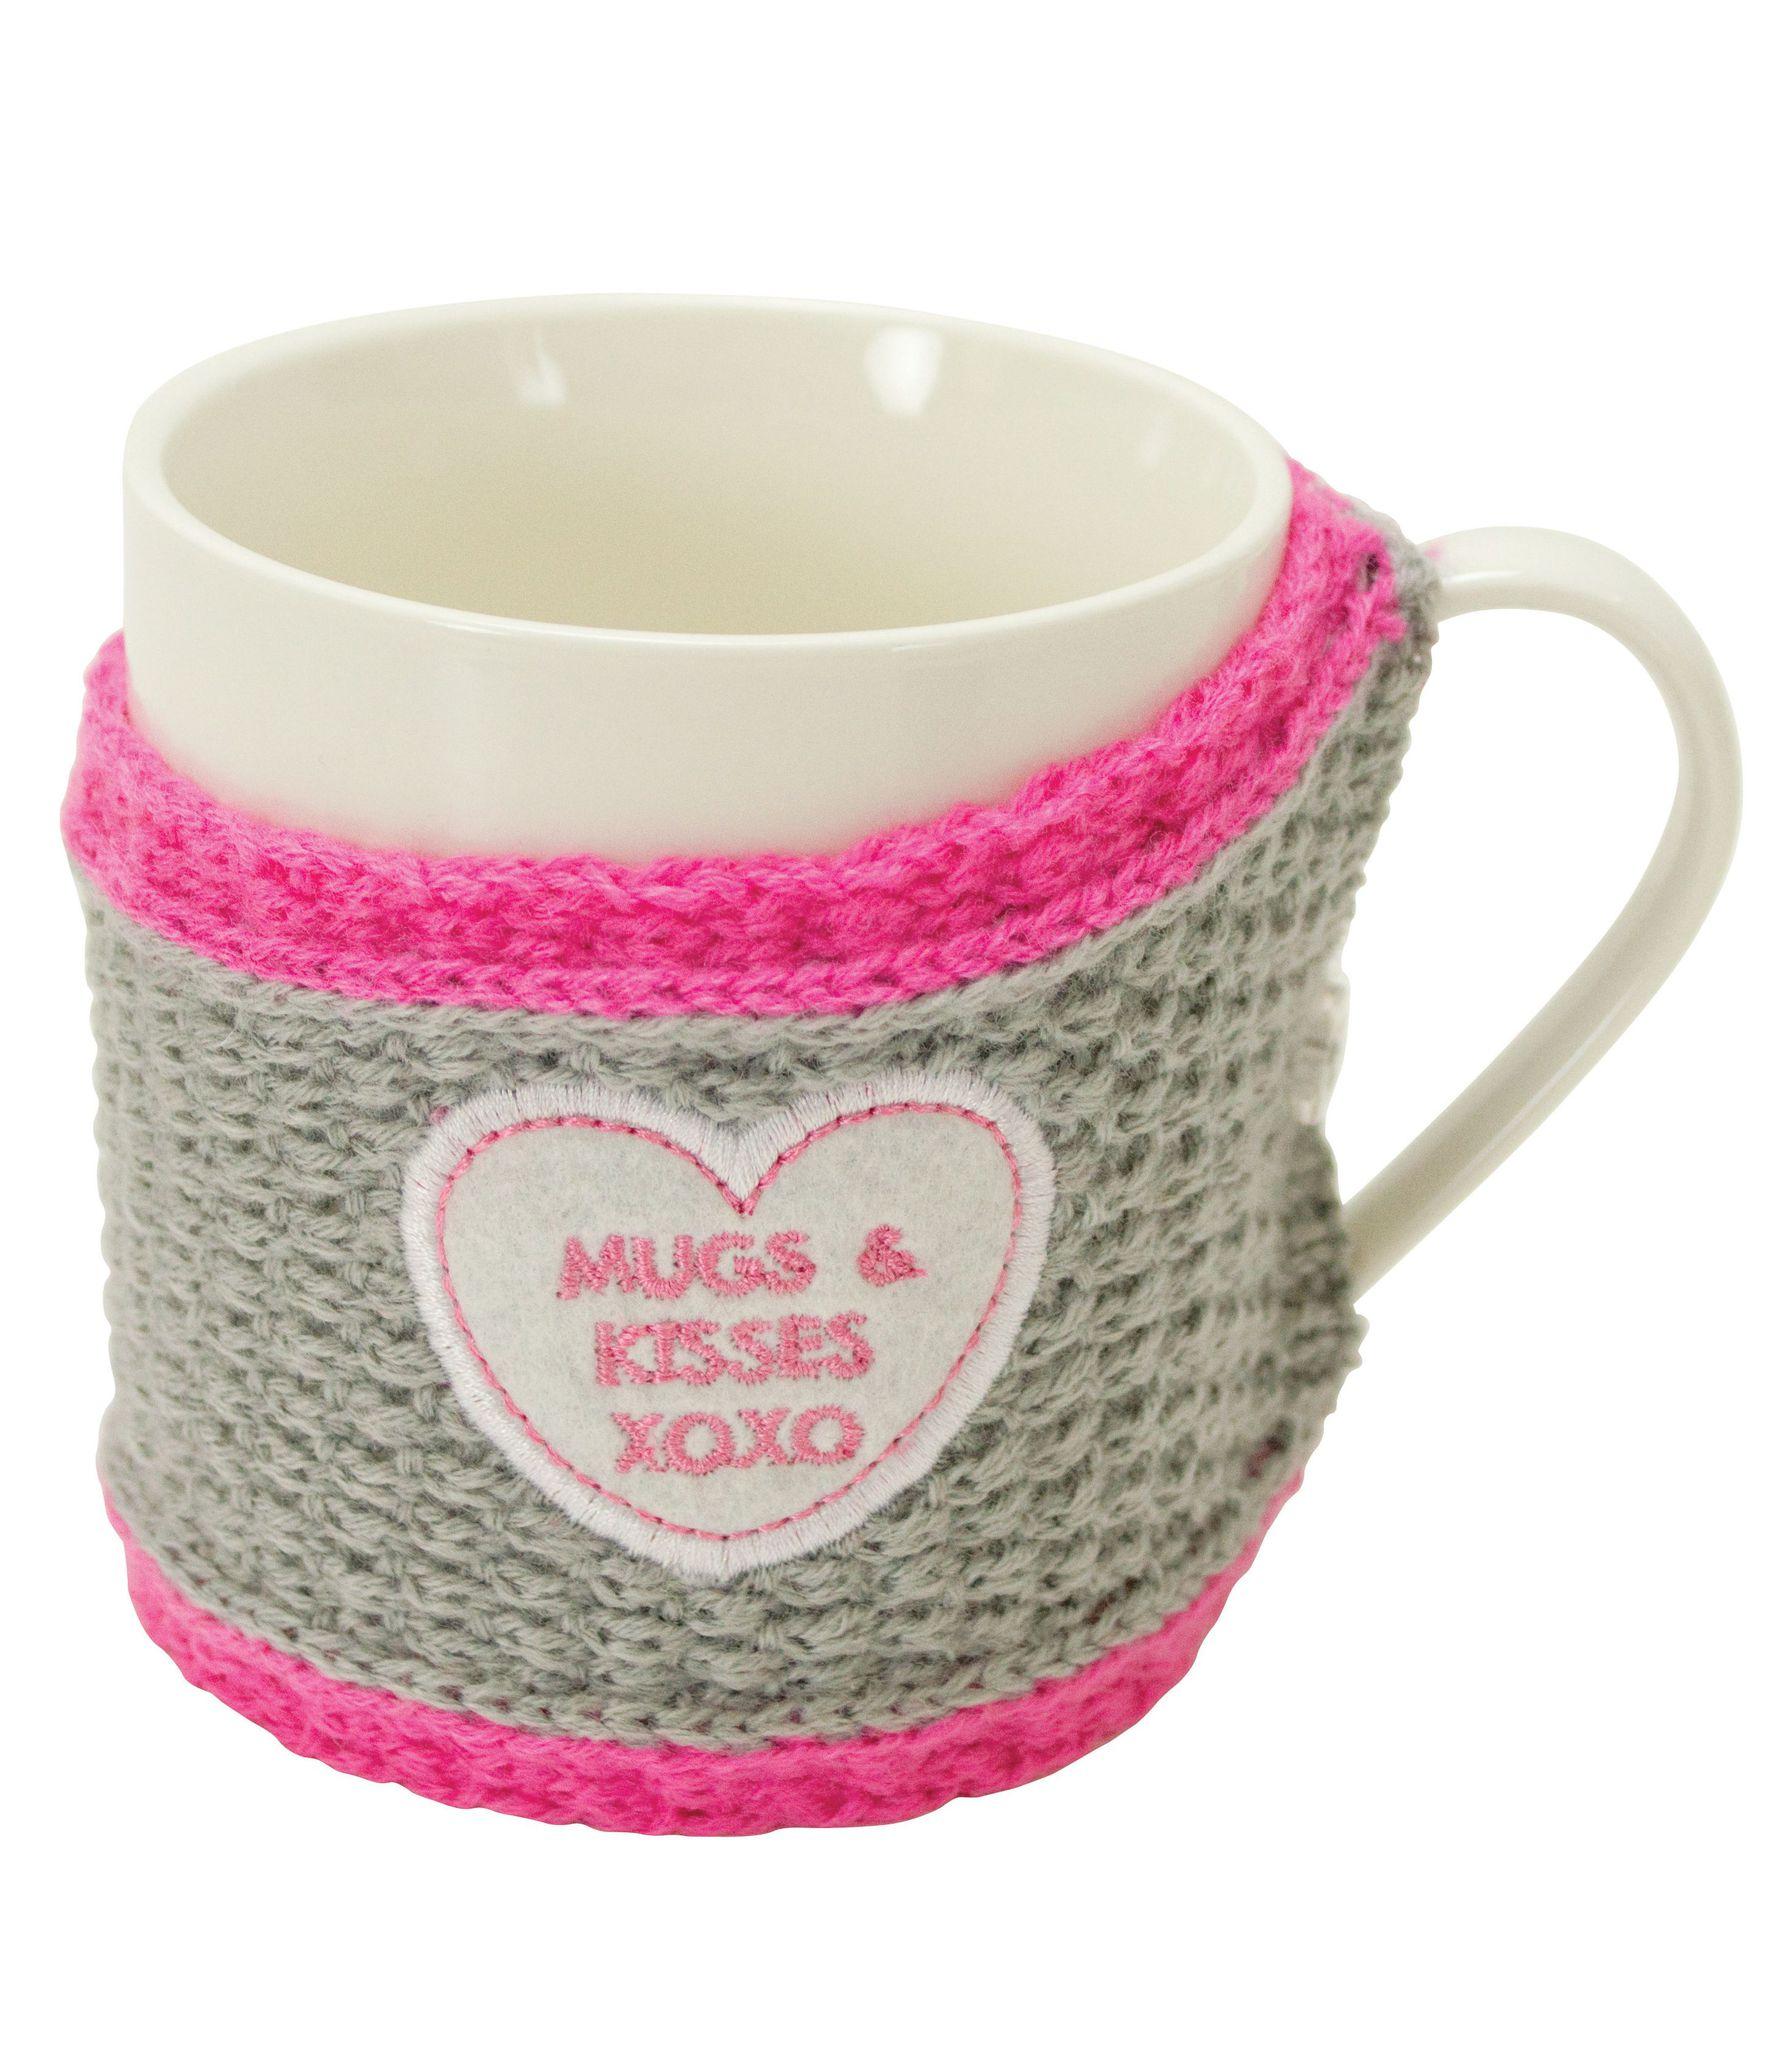 Кружки Кружка в свитере Boston Warehouse Sweater mug Mugs & Kisses kruzhka-v-svitere-boston-warehouse-sweater-mug-mugs-kisses-ssha-kitay.jpg